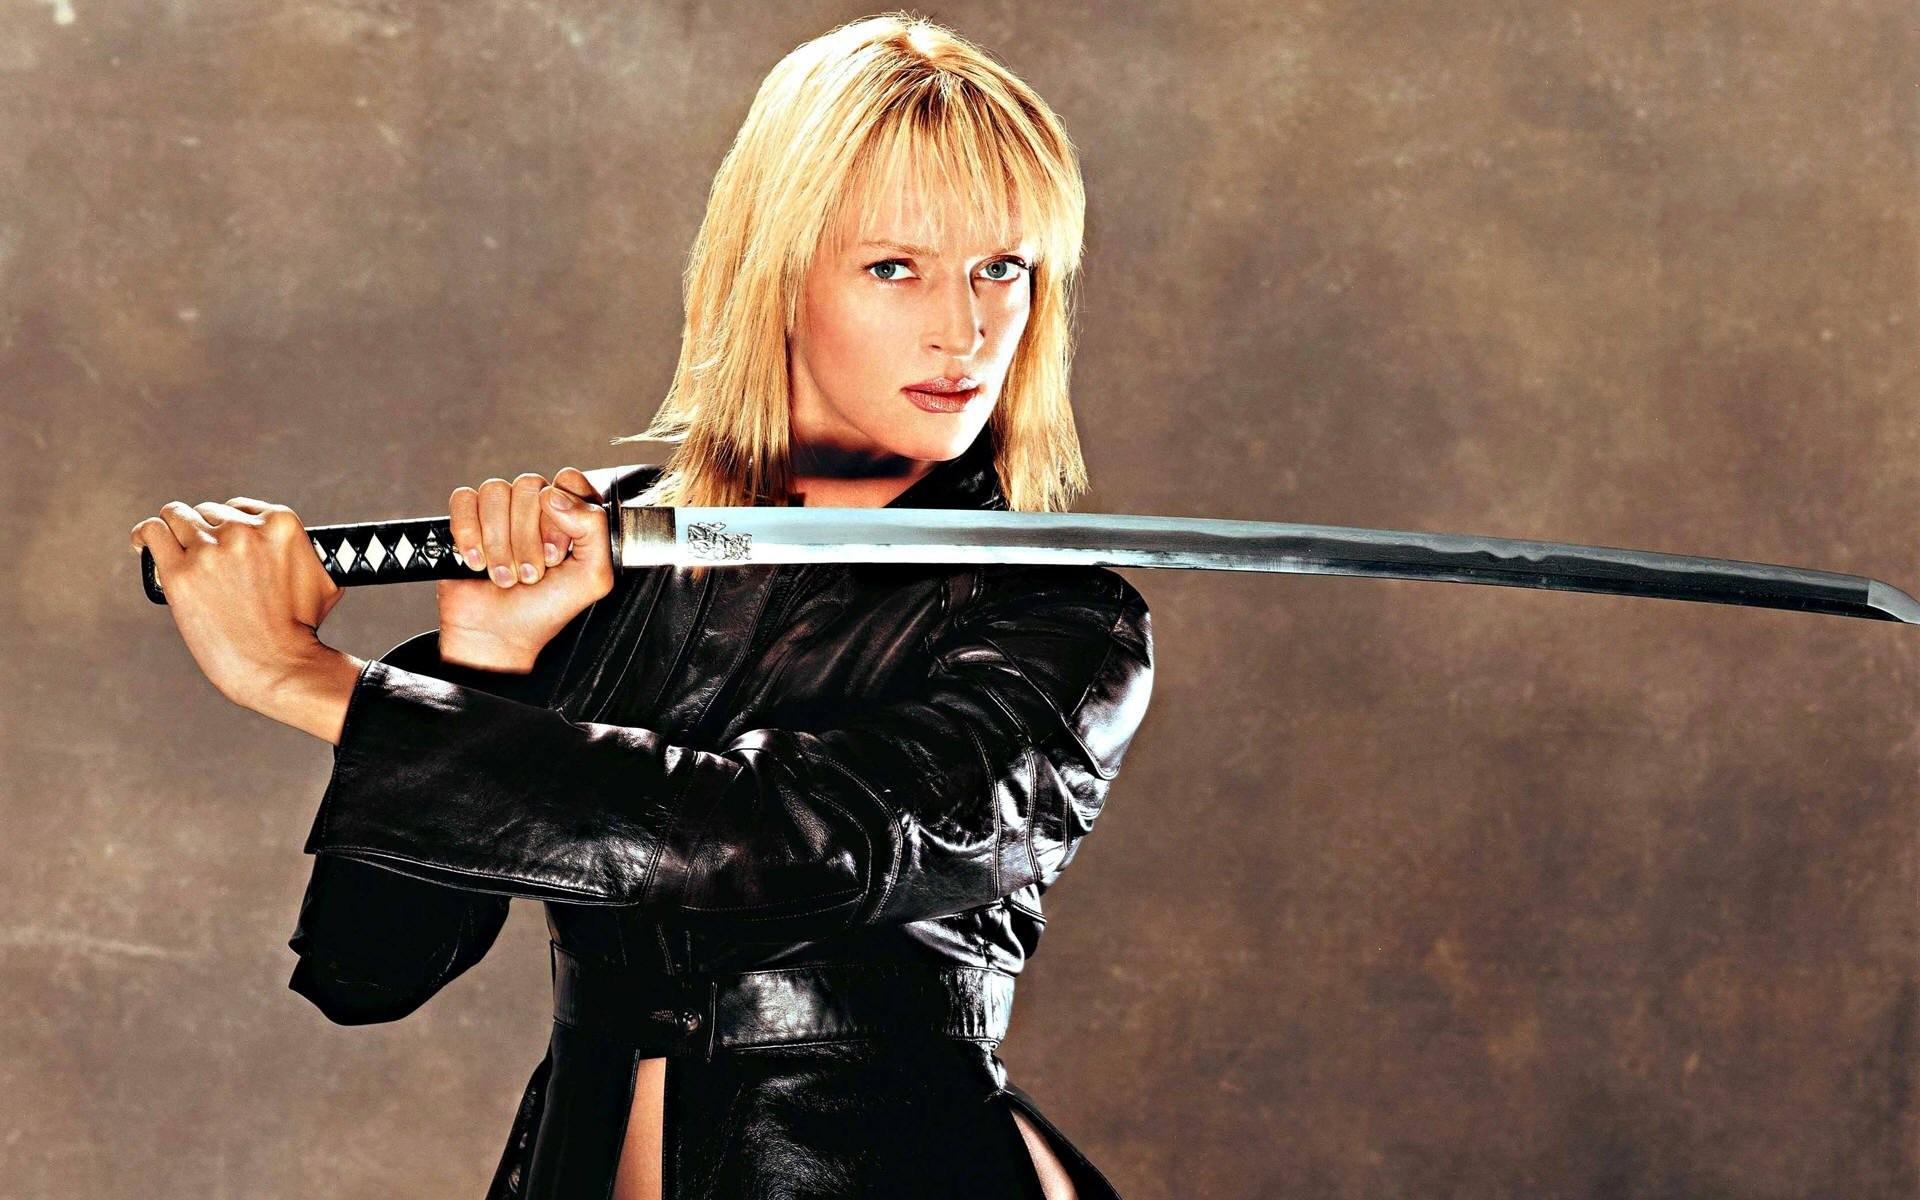 People 1920x1200 women blonde actress Uma Thurman blue eyes katana Kill Bill leather jackets simple background women with swords sword weapon movies